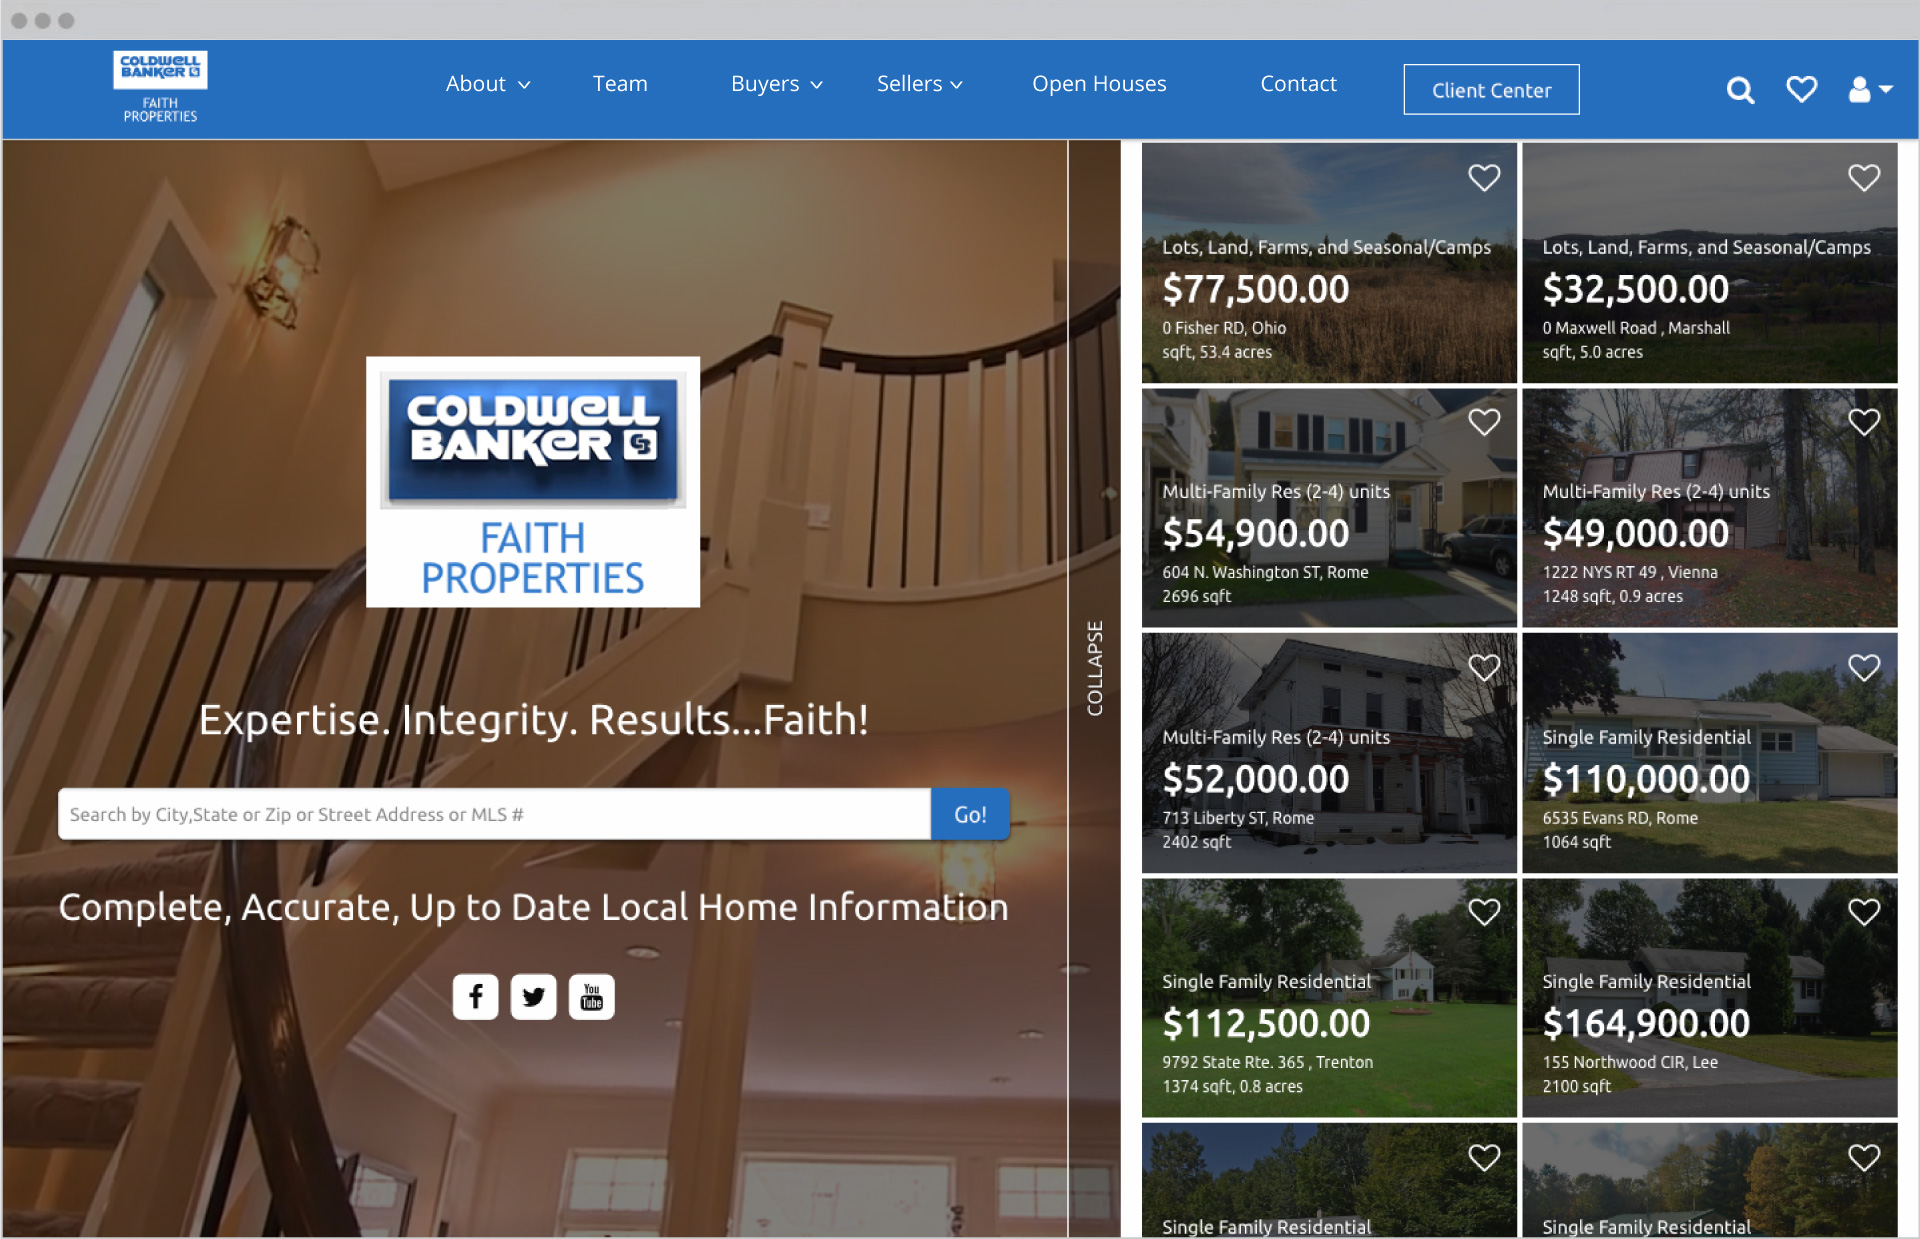 Faith Properties Homepage Design